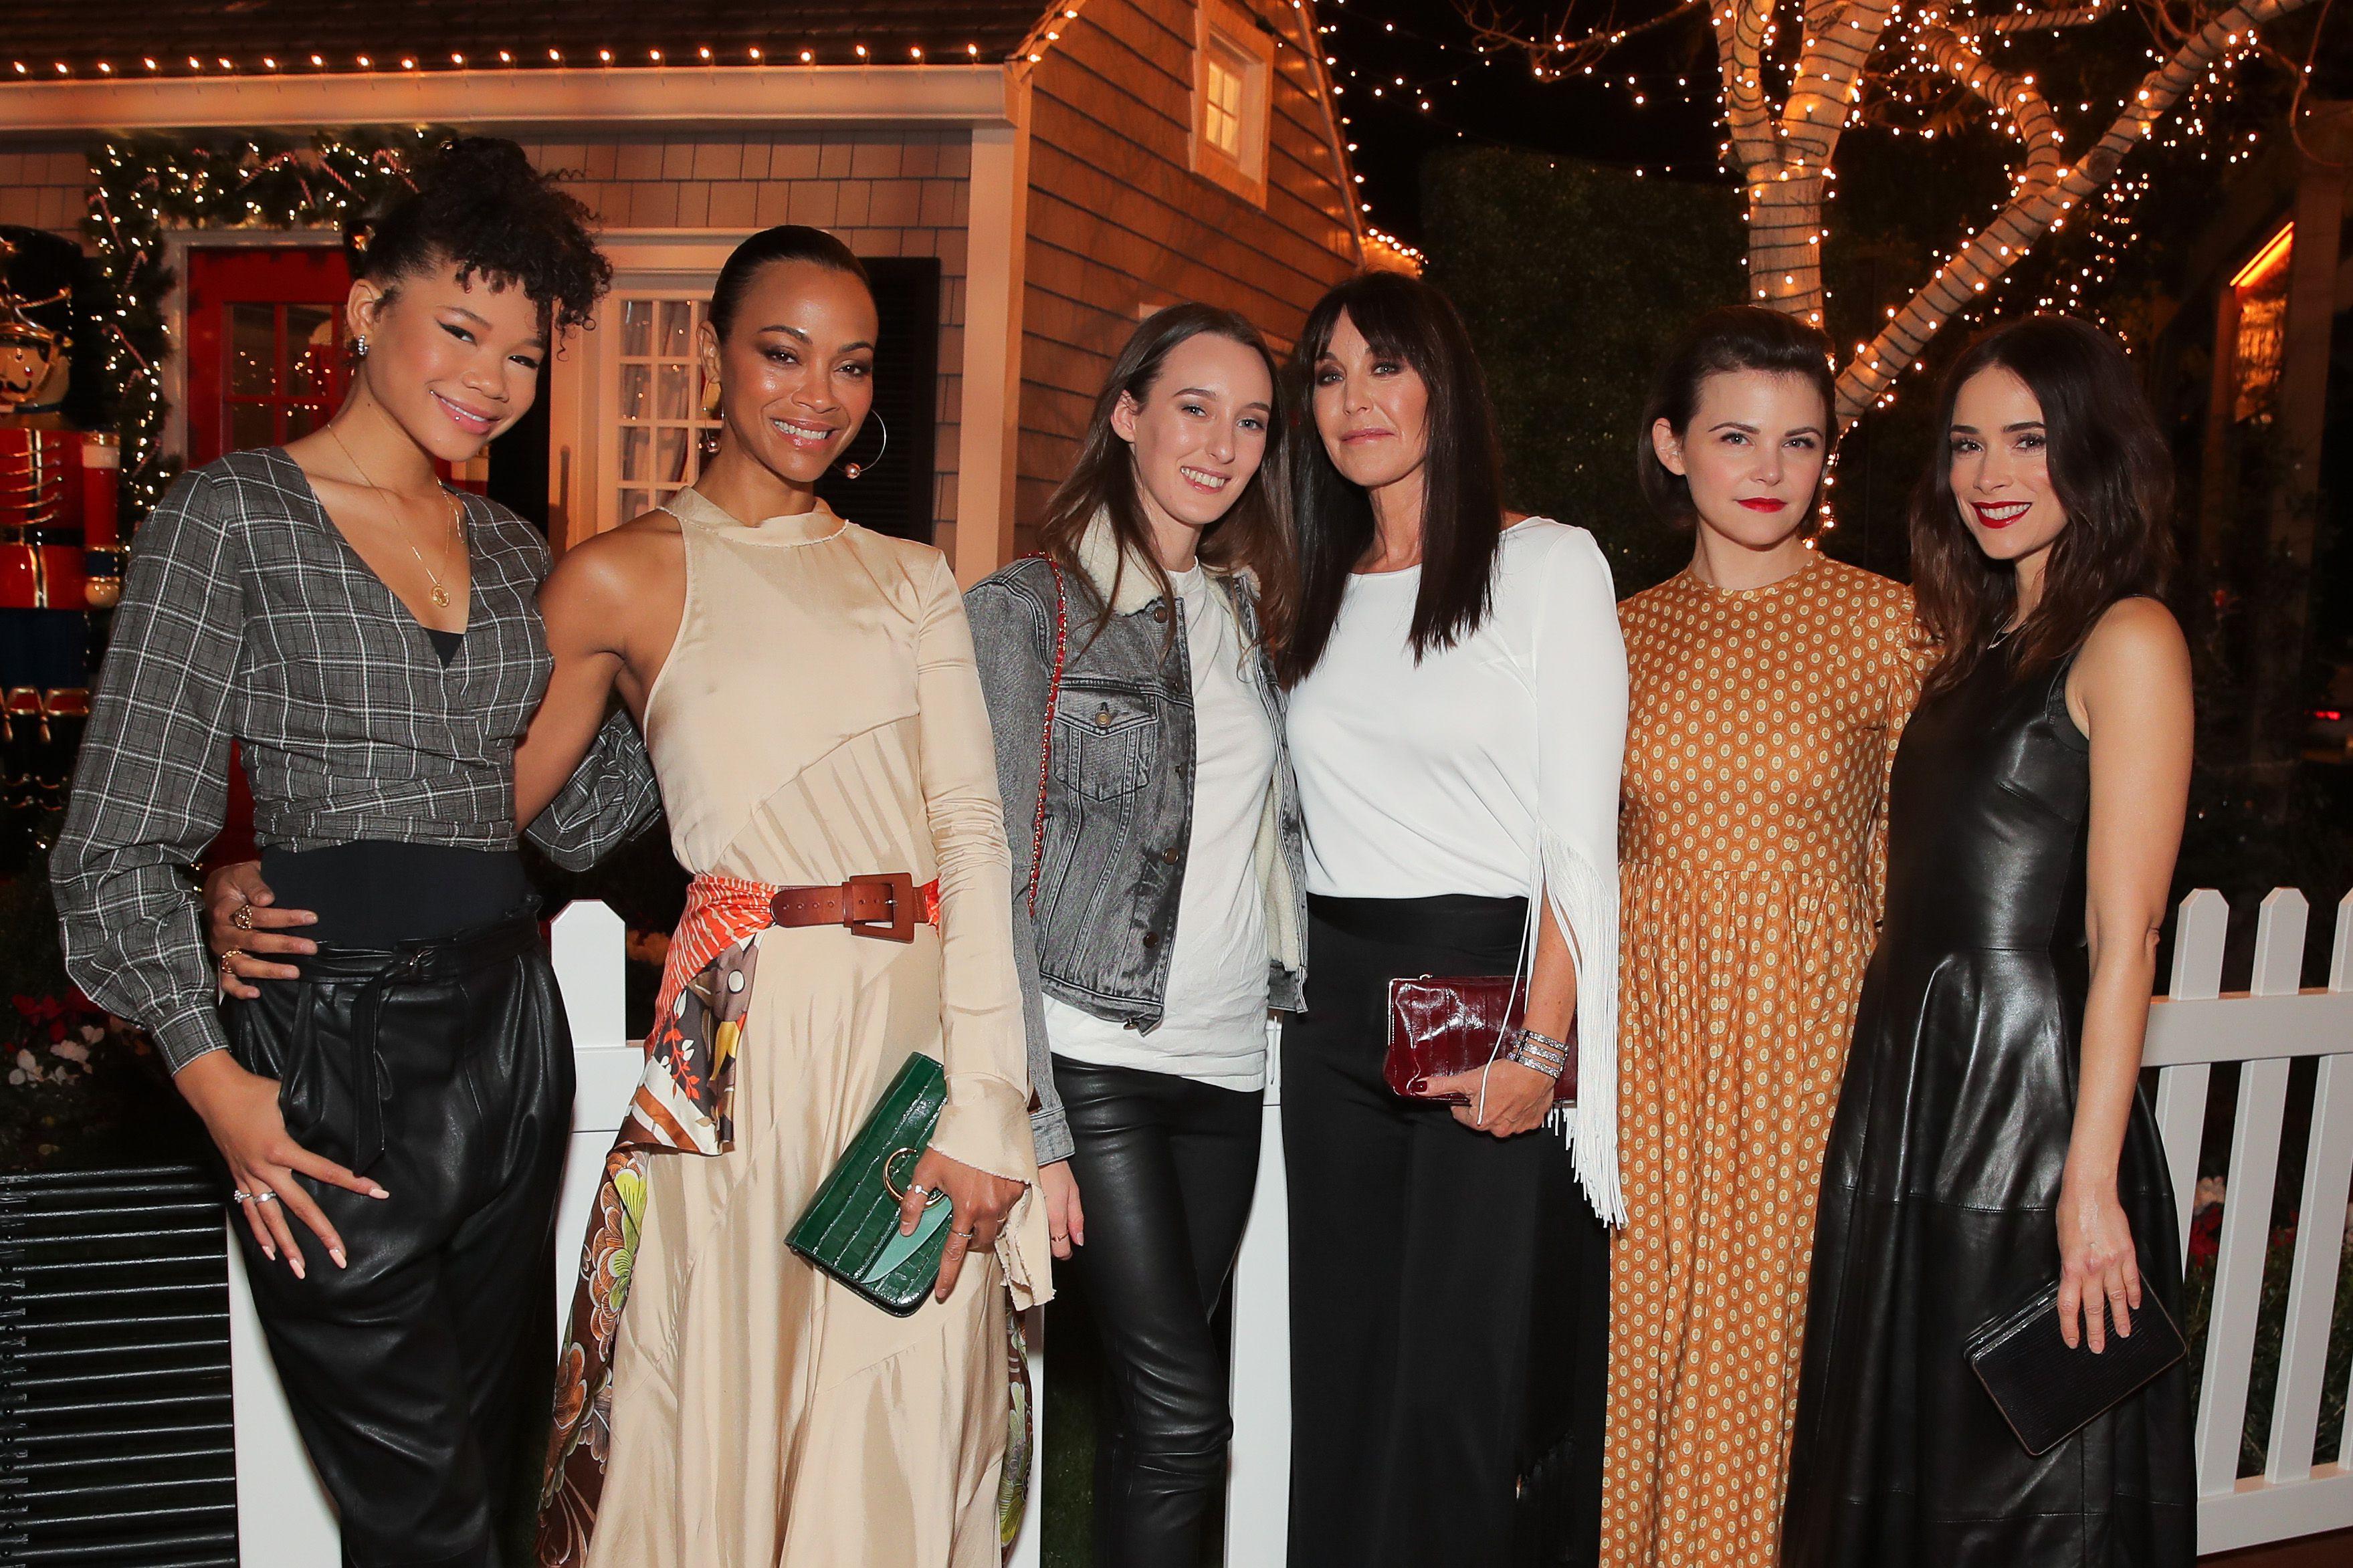 Storm Reid, Zoe Saldana, Araminta Mellon, Tamara Mellon, Ginnifer Goodwin and Abigail SpencerTamara Mellon Palisades Village store launch party, Los Angeles, USA - 11 Dec 2018